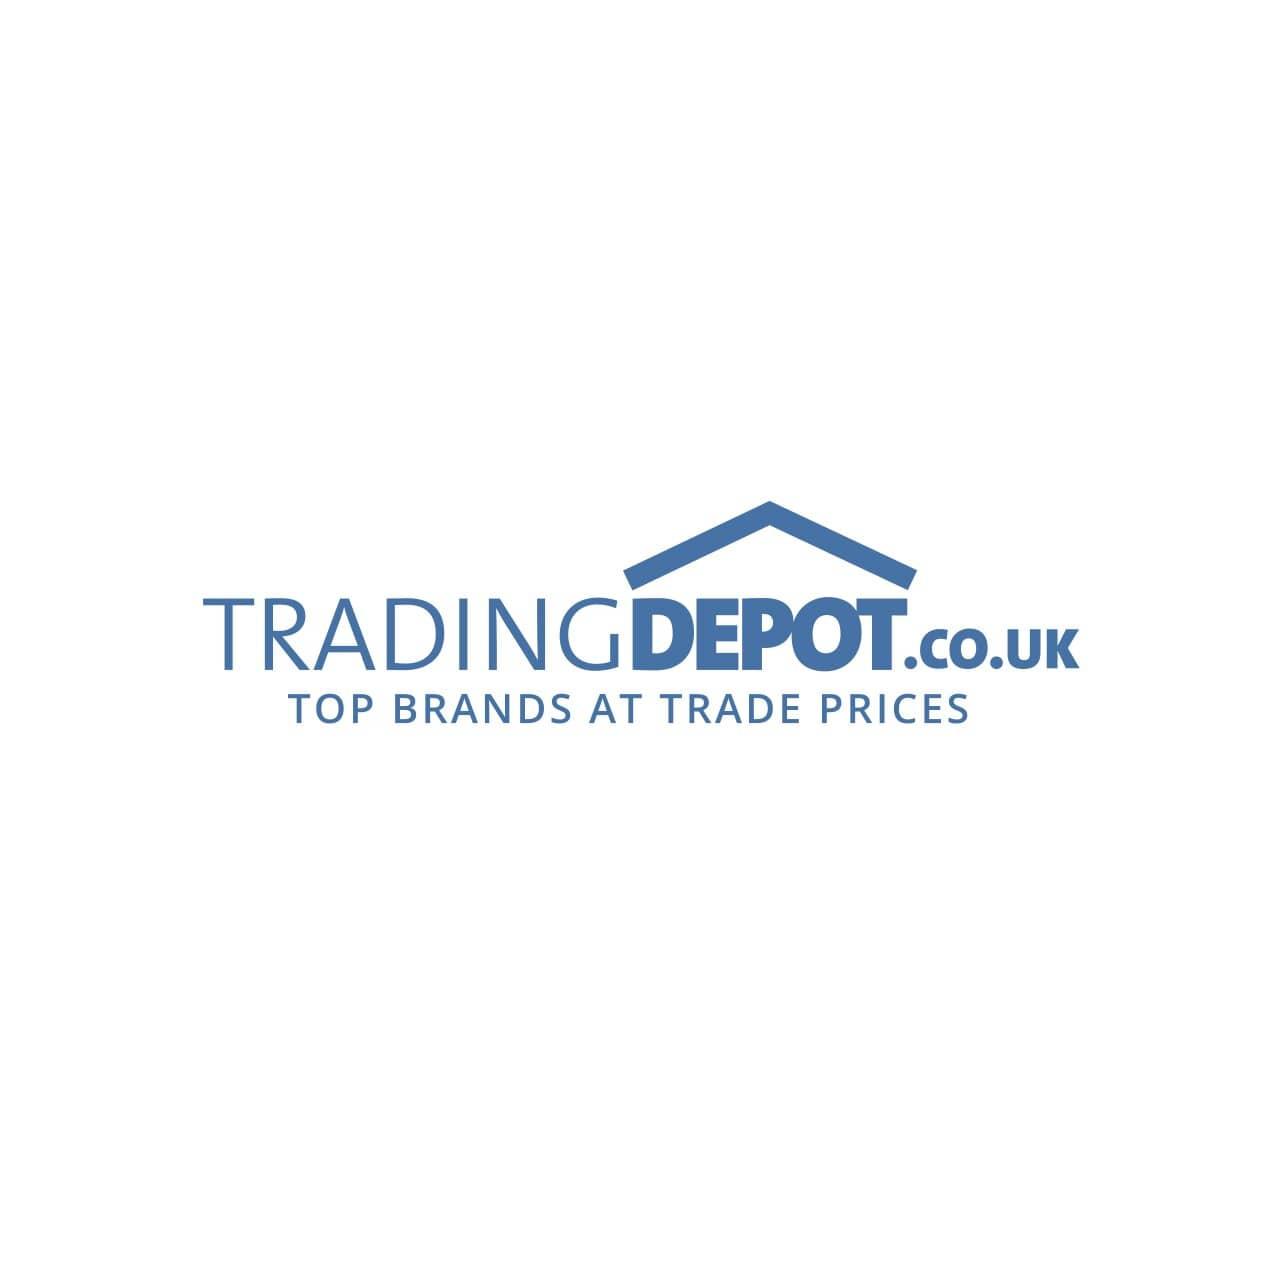 LPD Chigwell Clear Glazed Hardwood M&T Door 762x1981x44mm - MTCHICGDG30